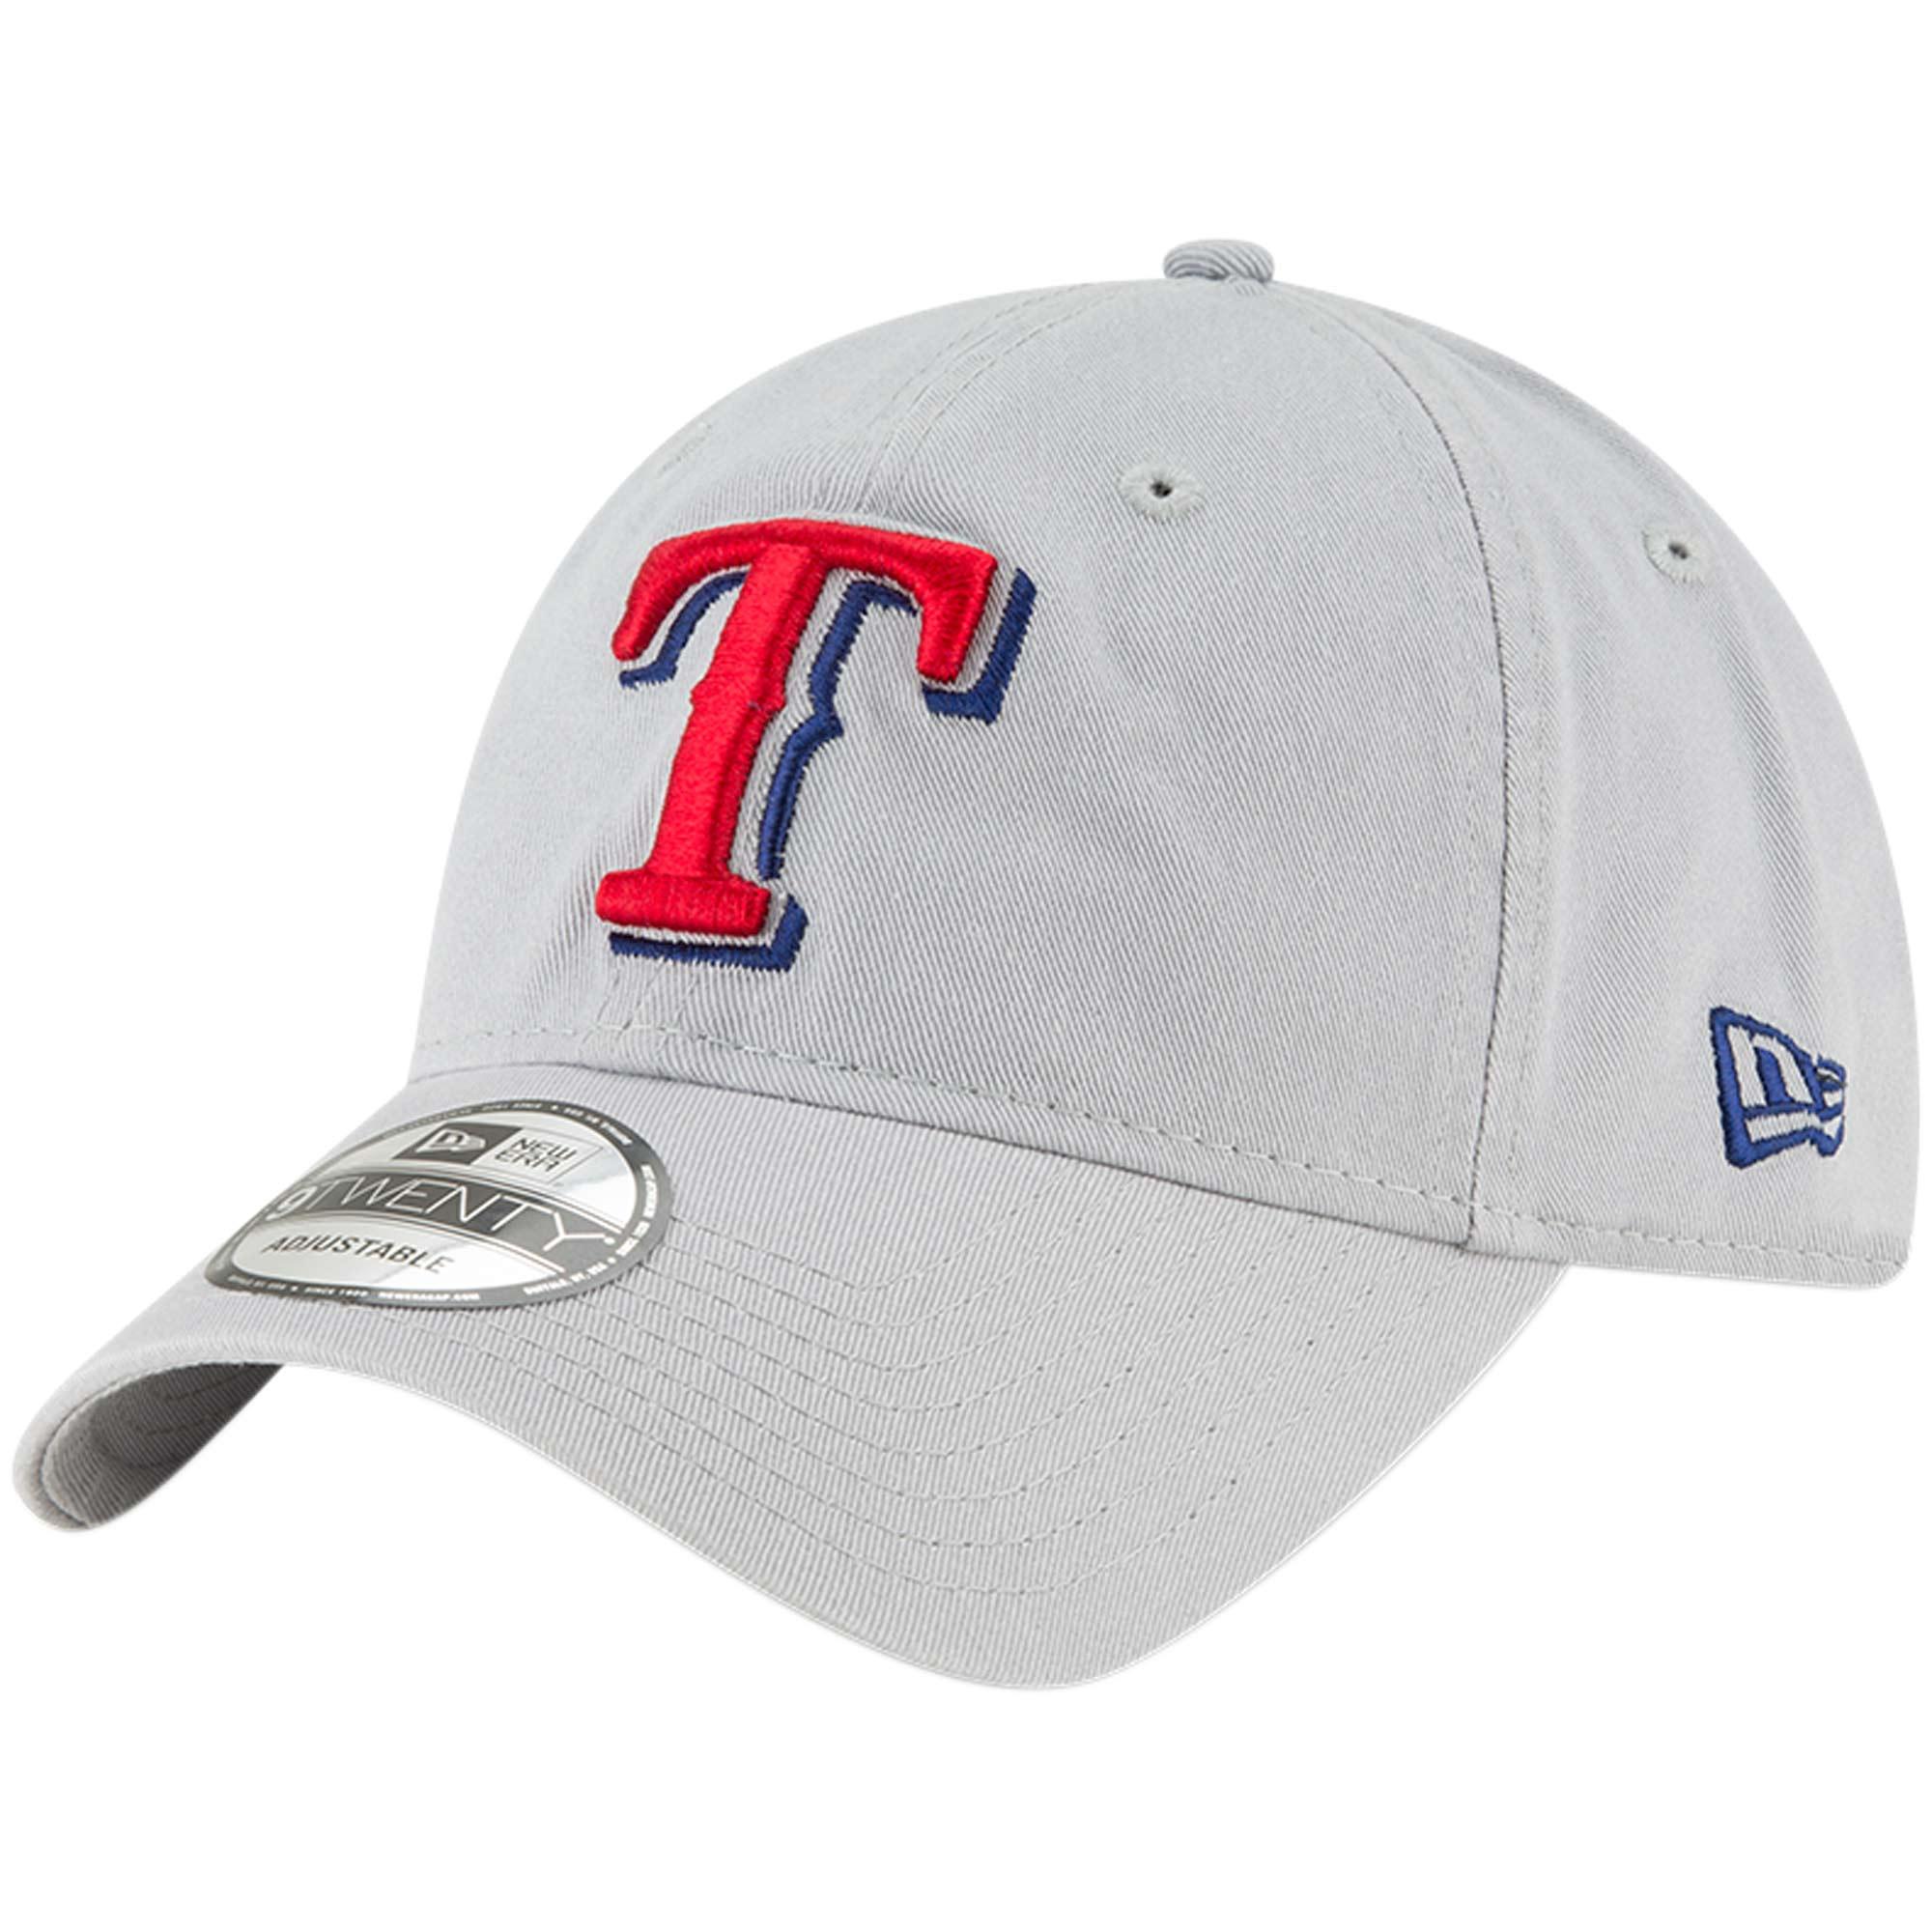 Texas Rangers New Era Core Classic Twill 9TWENTY Adjustable Hat - Gray - OSFA